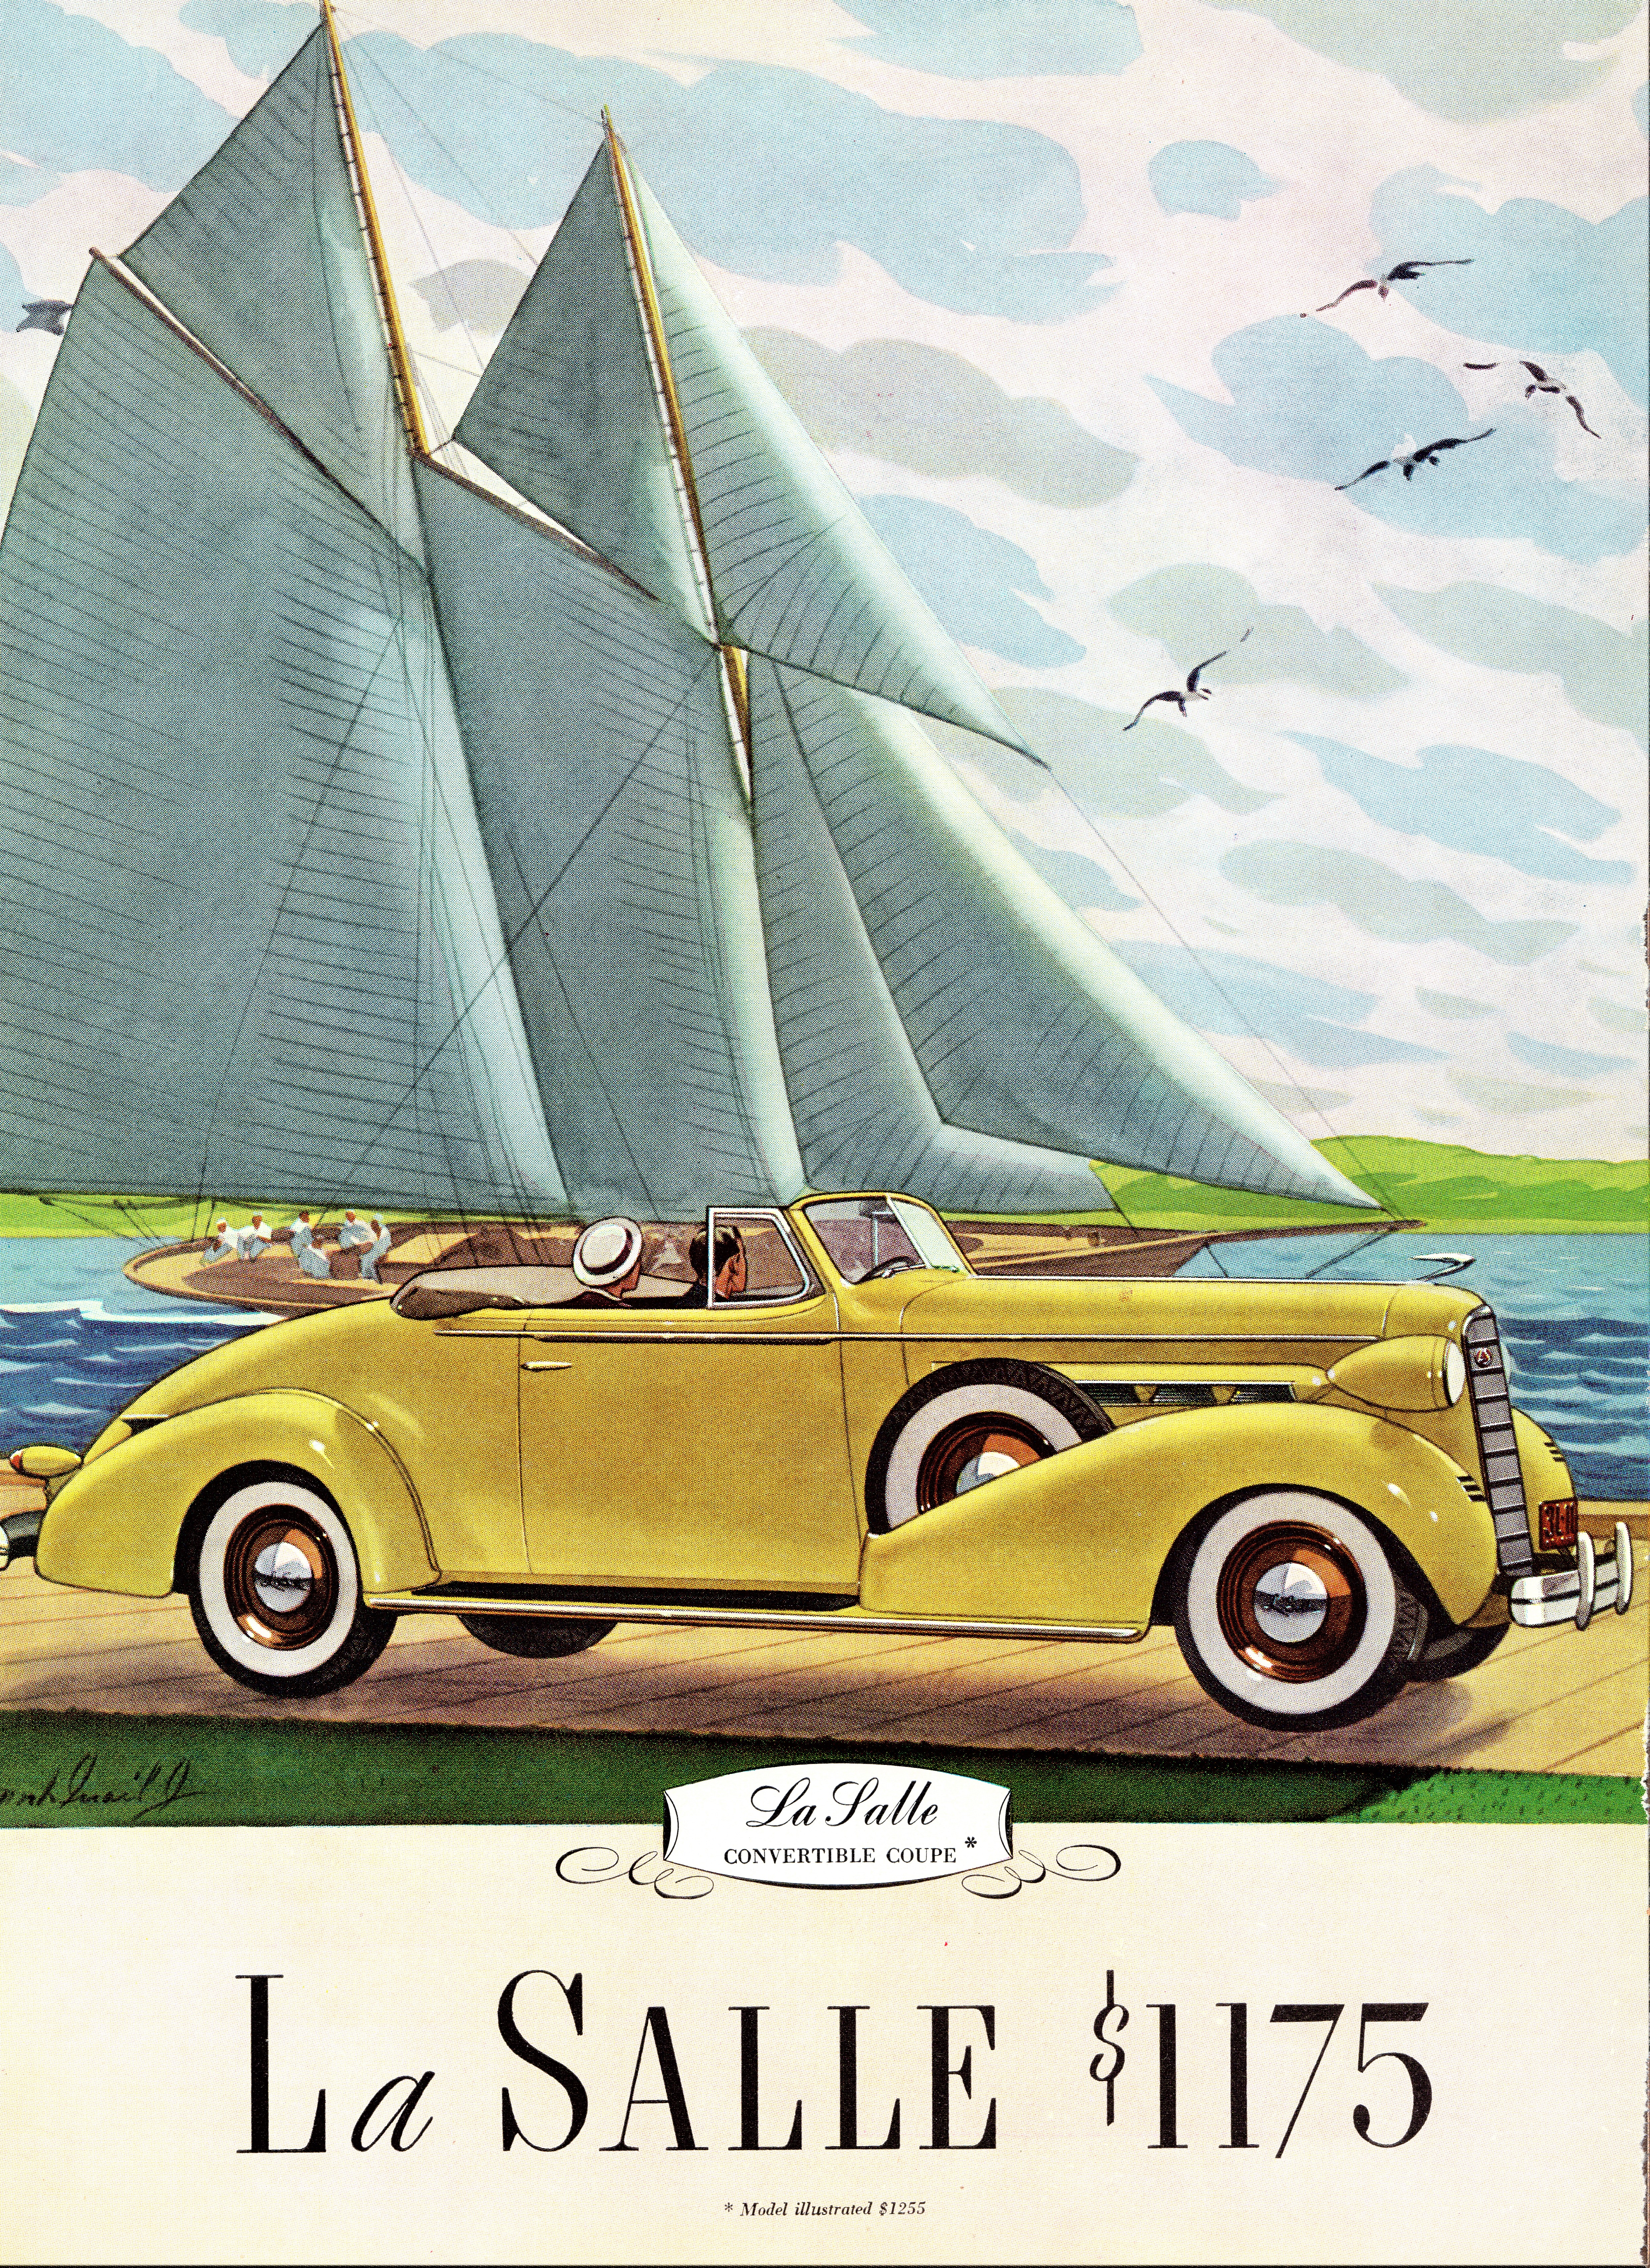 1936 La Salle Convertible Coupe